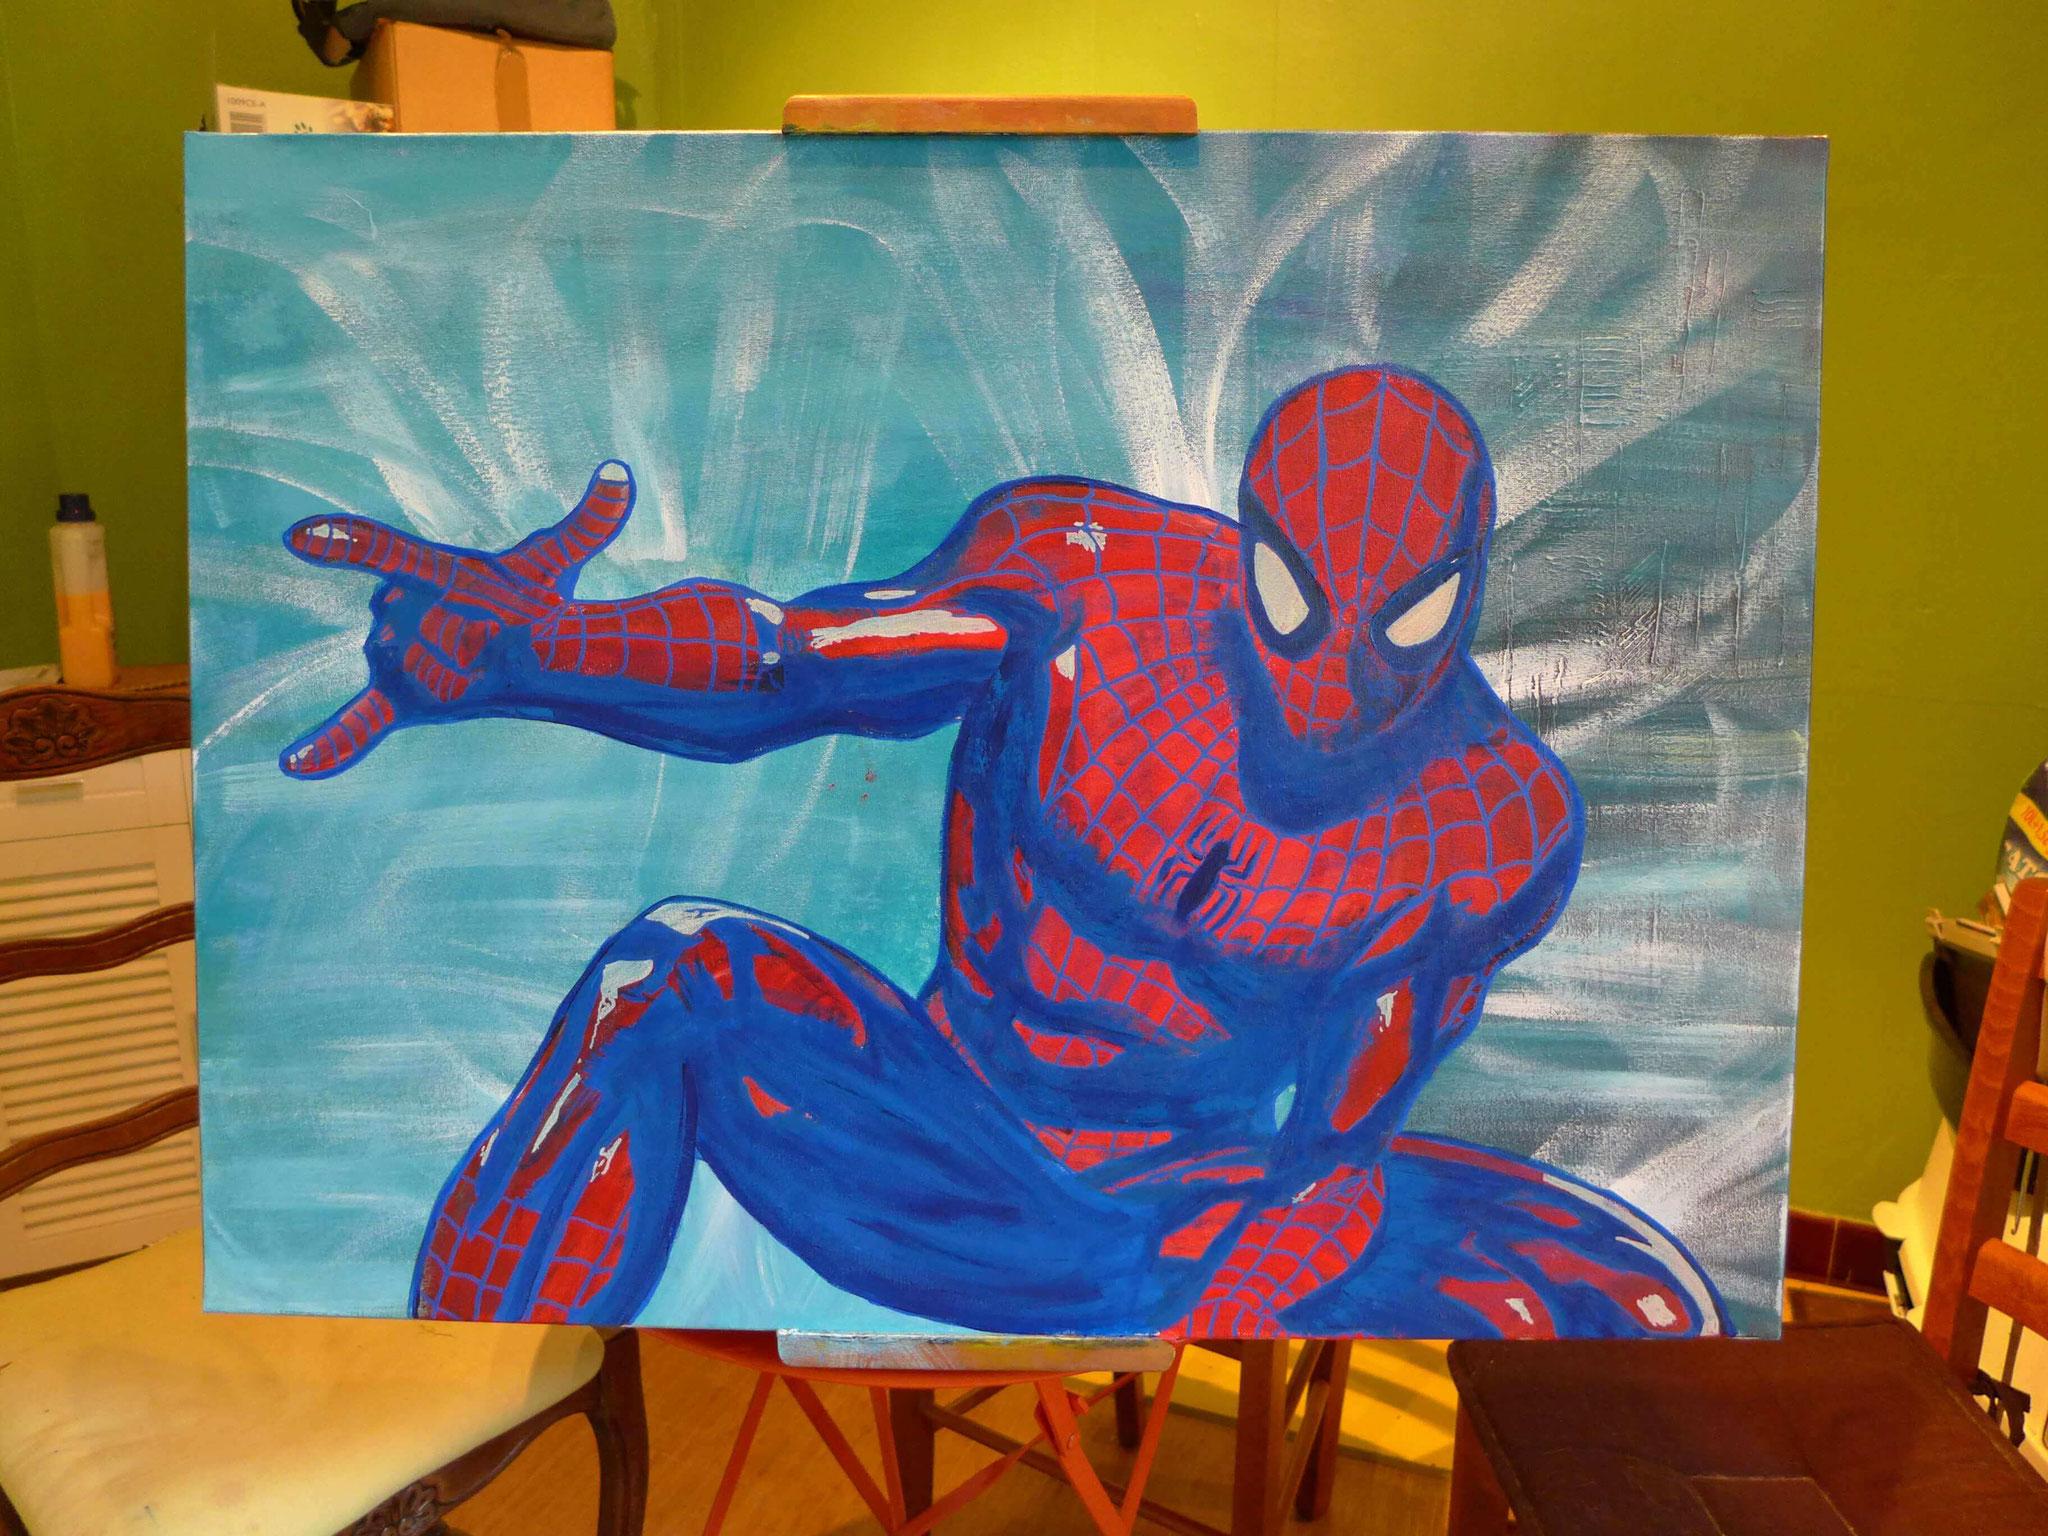 spiderman-tableau-pas-cher-street-style.jpg